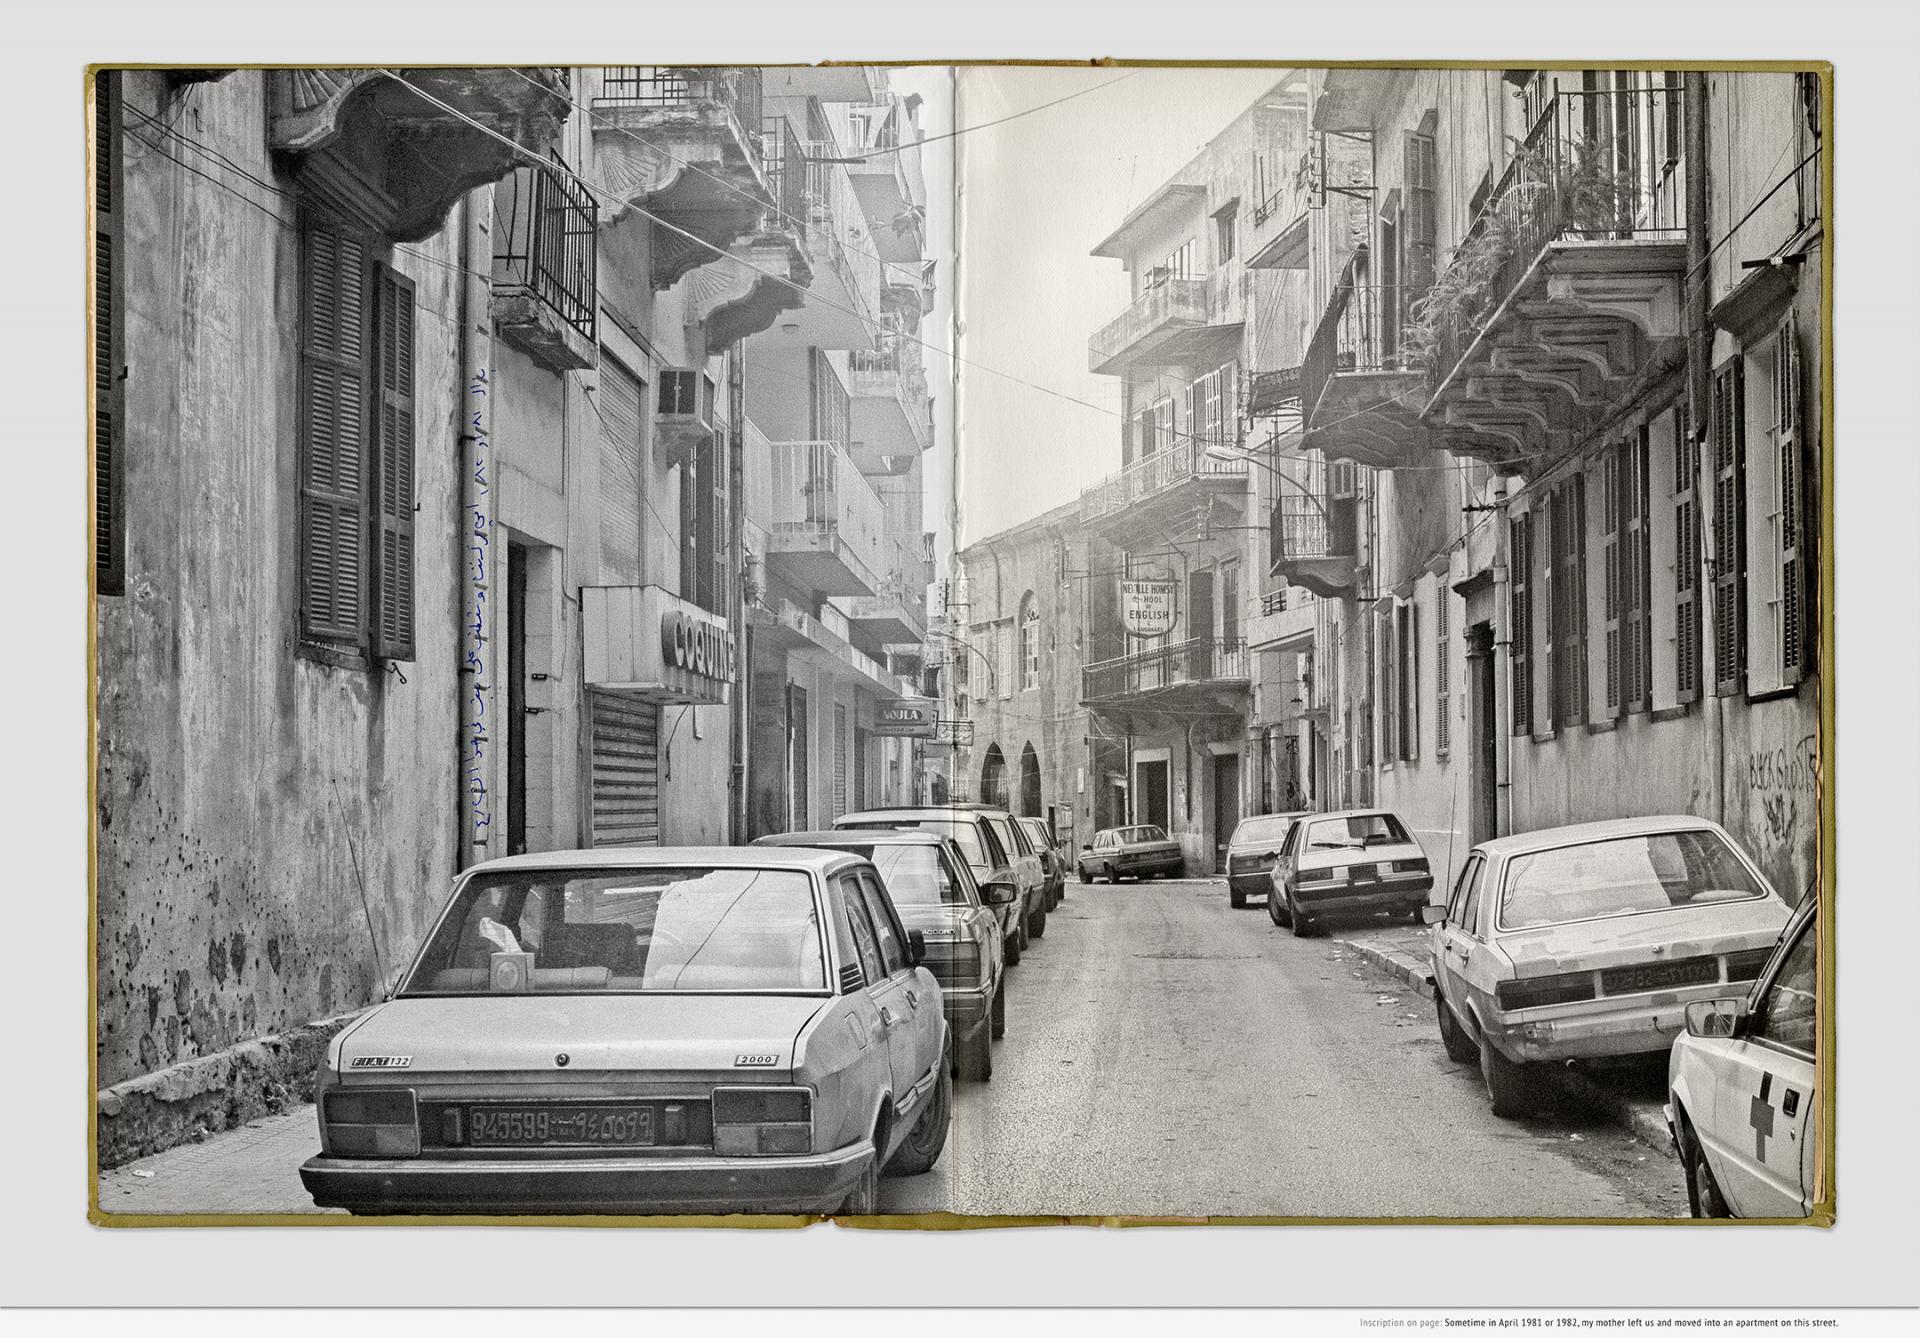 Sweet Talk. Commissions (Beirut) _ 1987.005, 1987-2019, inkjet print, 54.3 x 76.3 x 3.5cm, framed